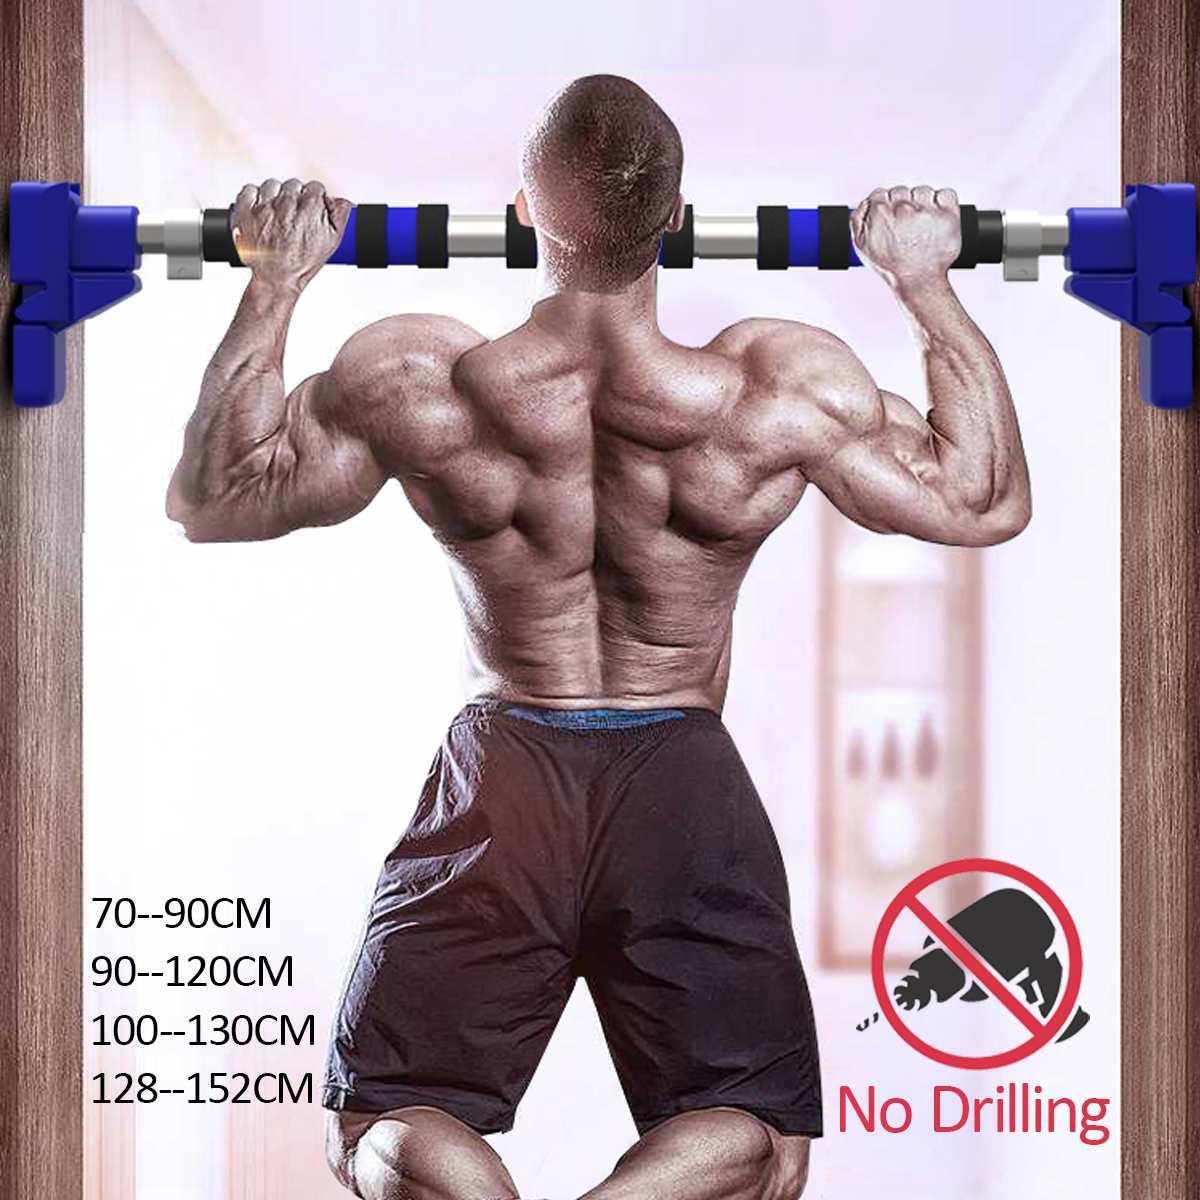 Tür Horizontale Bars Stahl 500kg Home Gym Workout Kinn push-Up Pull Up Training Bar Sport Fitness Sitzen- ups Ausrüstungen Heavy Duty